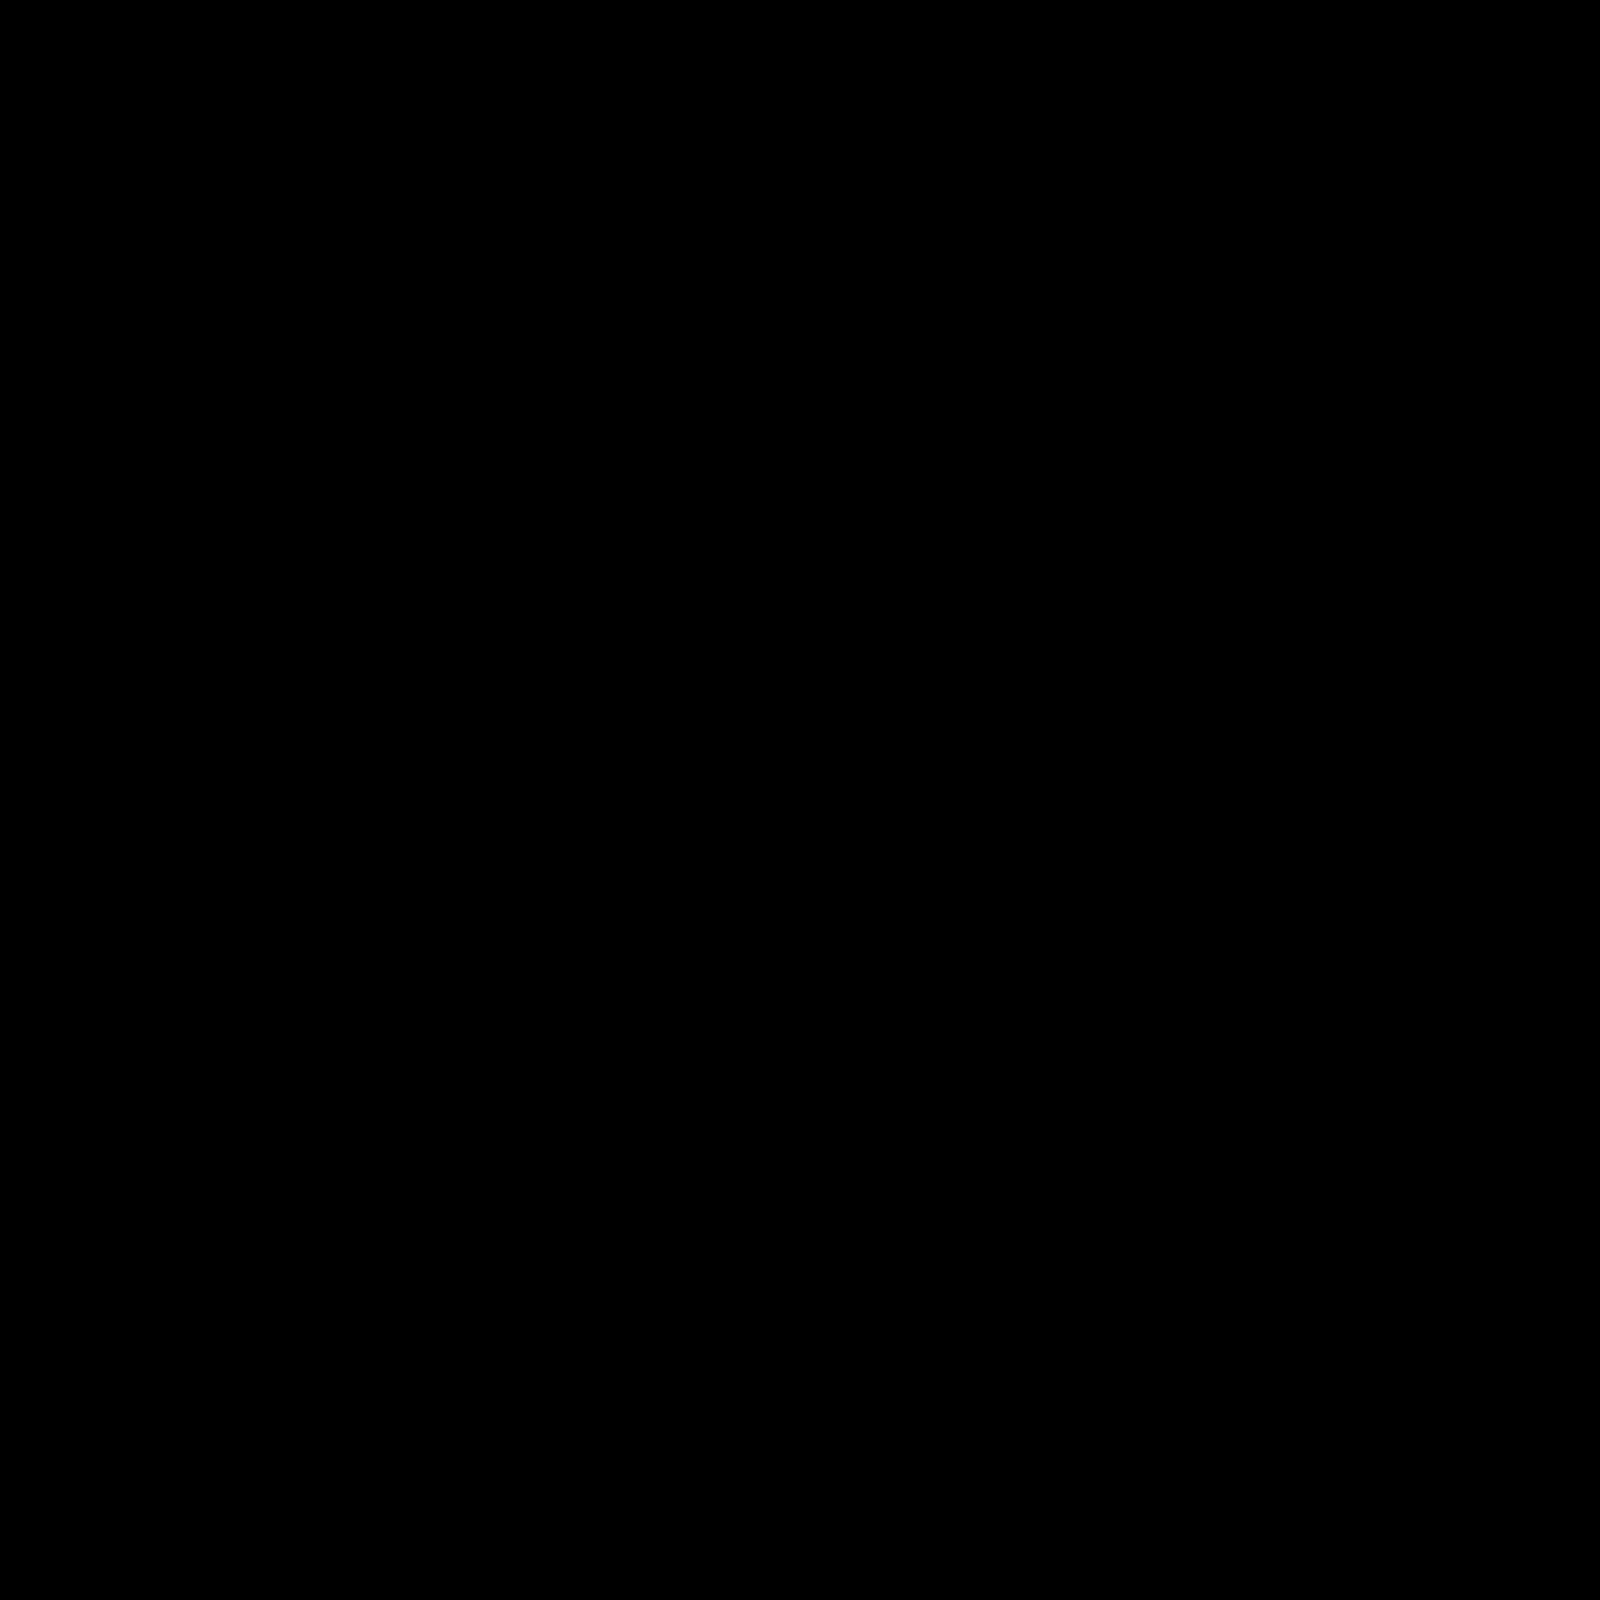 Test Failed icon